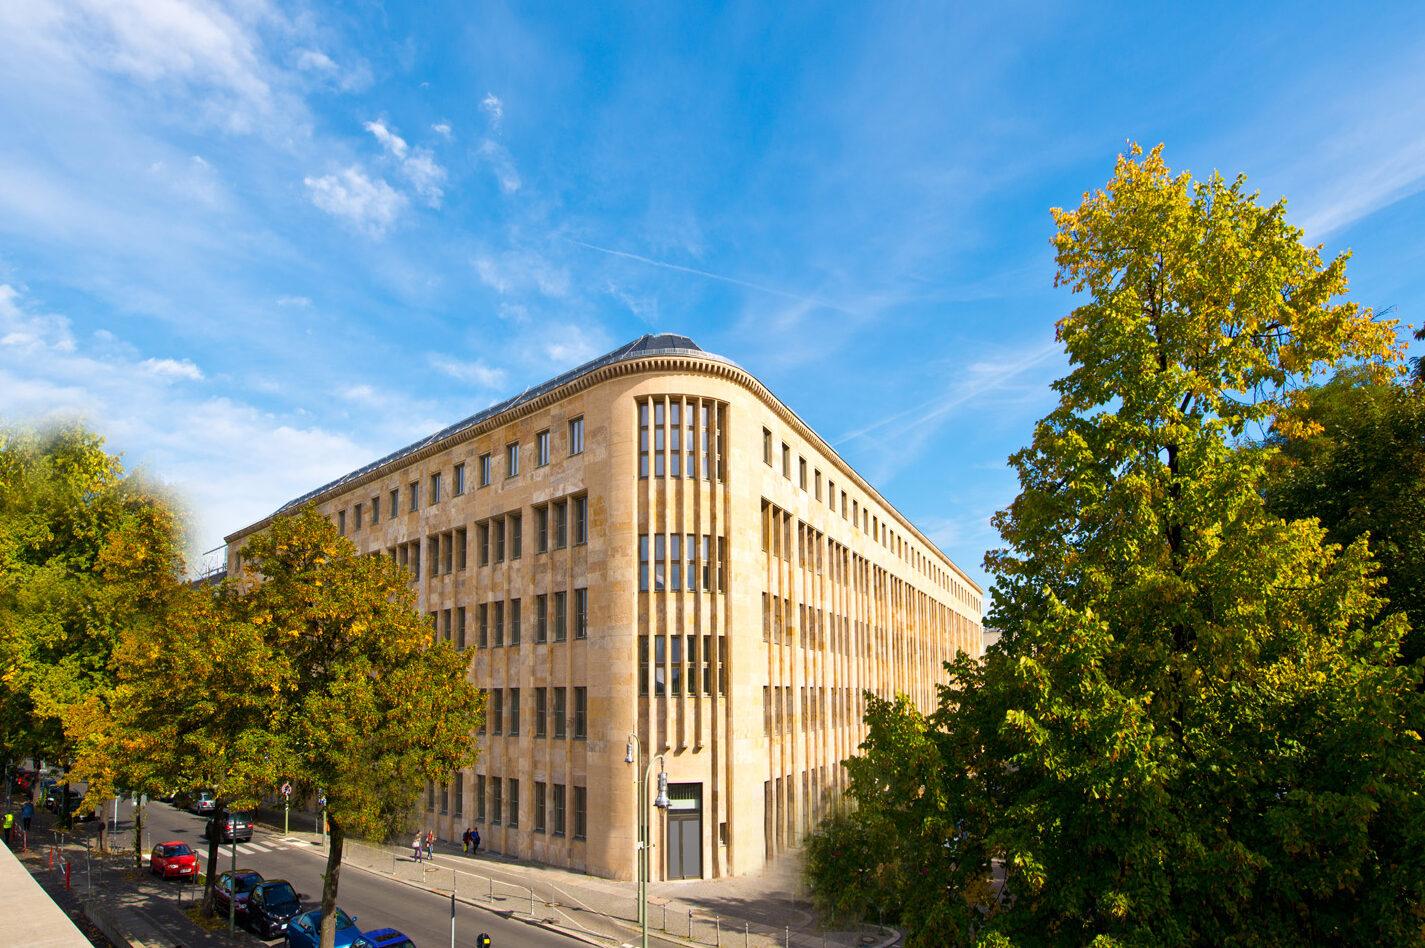 CROWNE PLAZA POTSDAMER PLATZ BERLIN